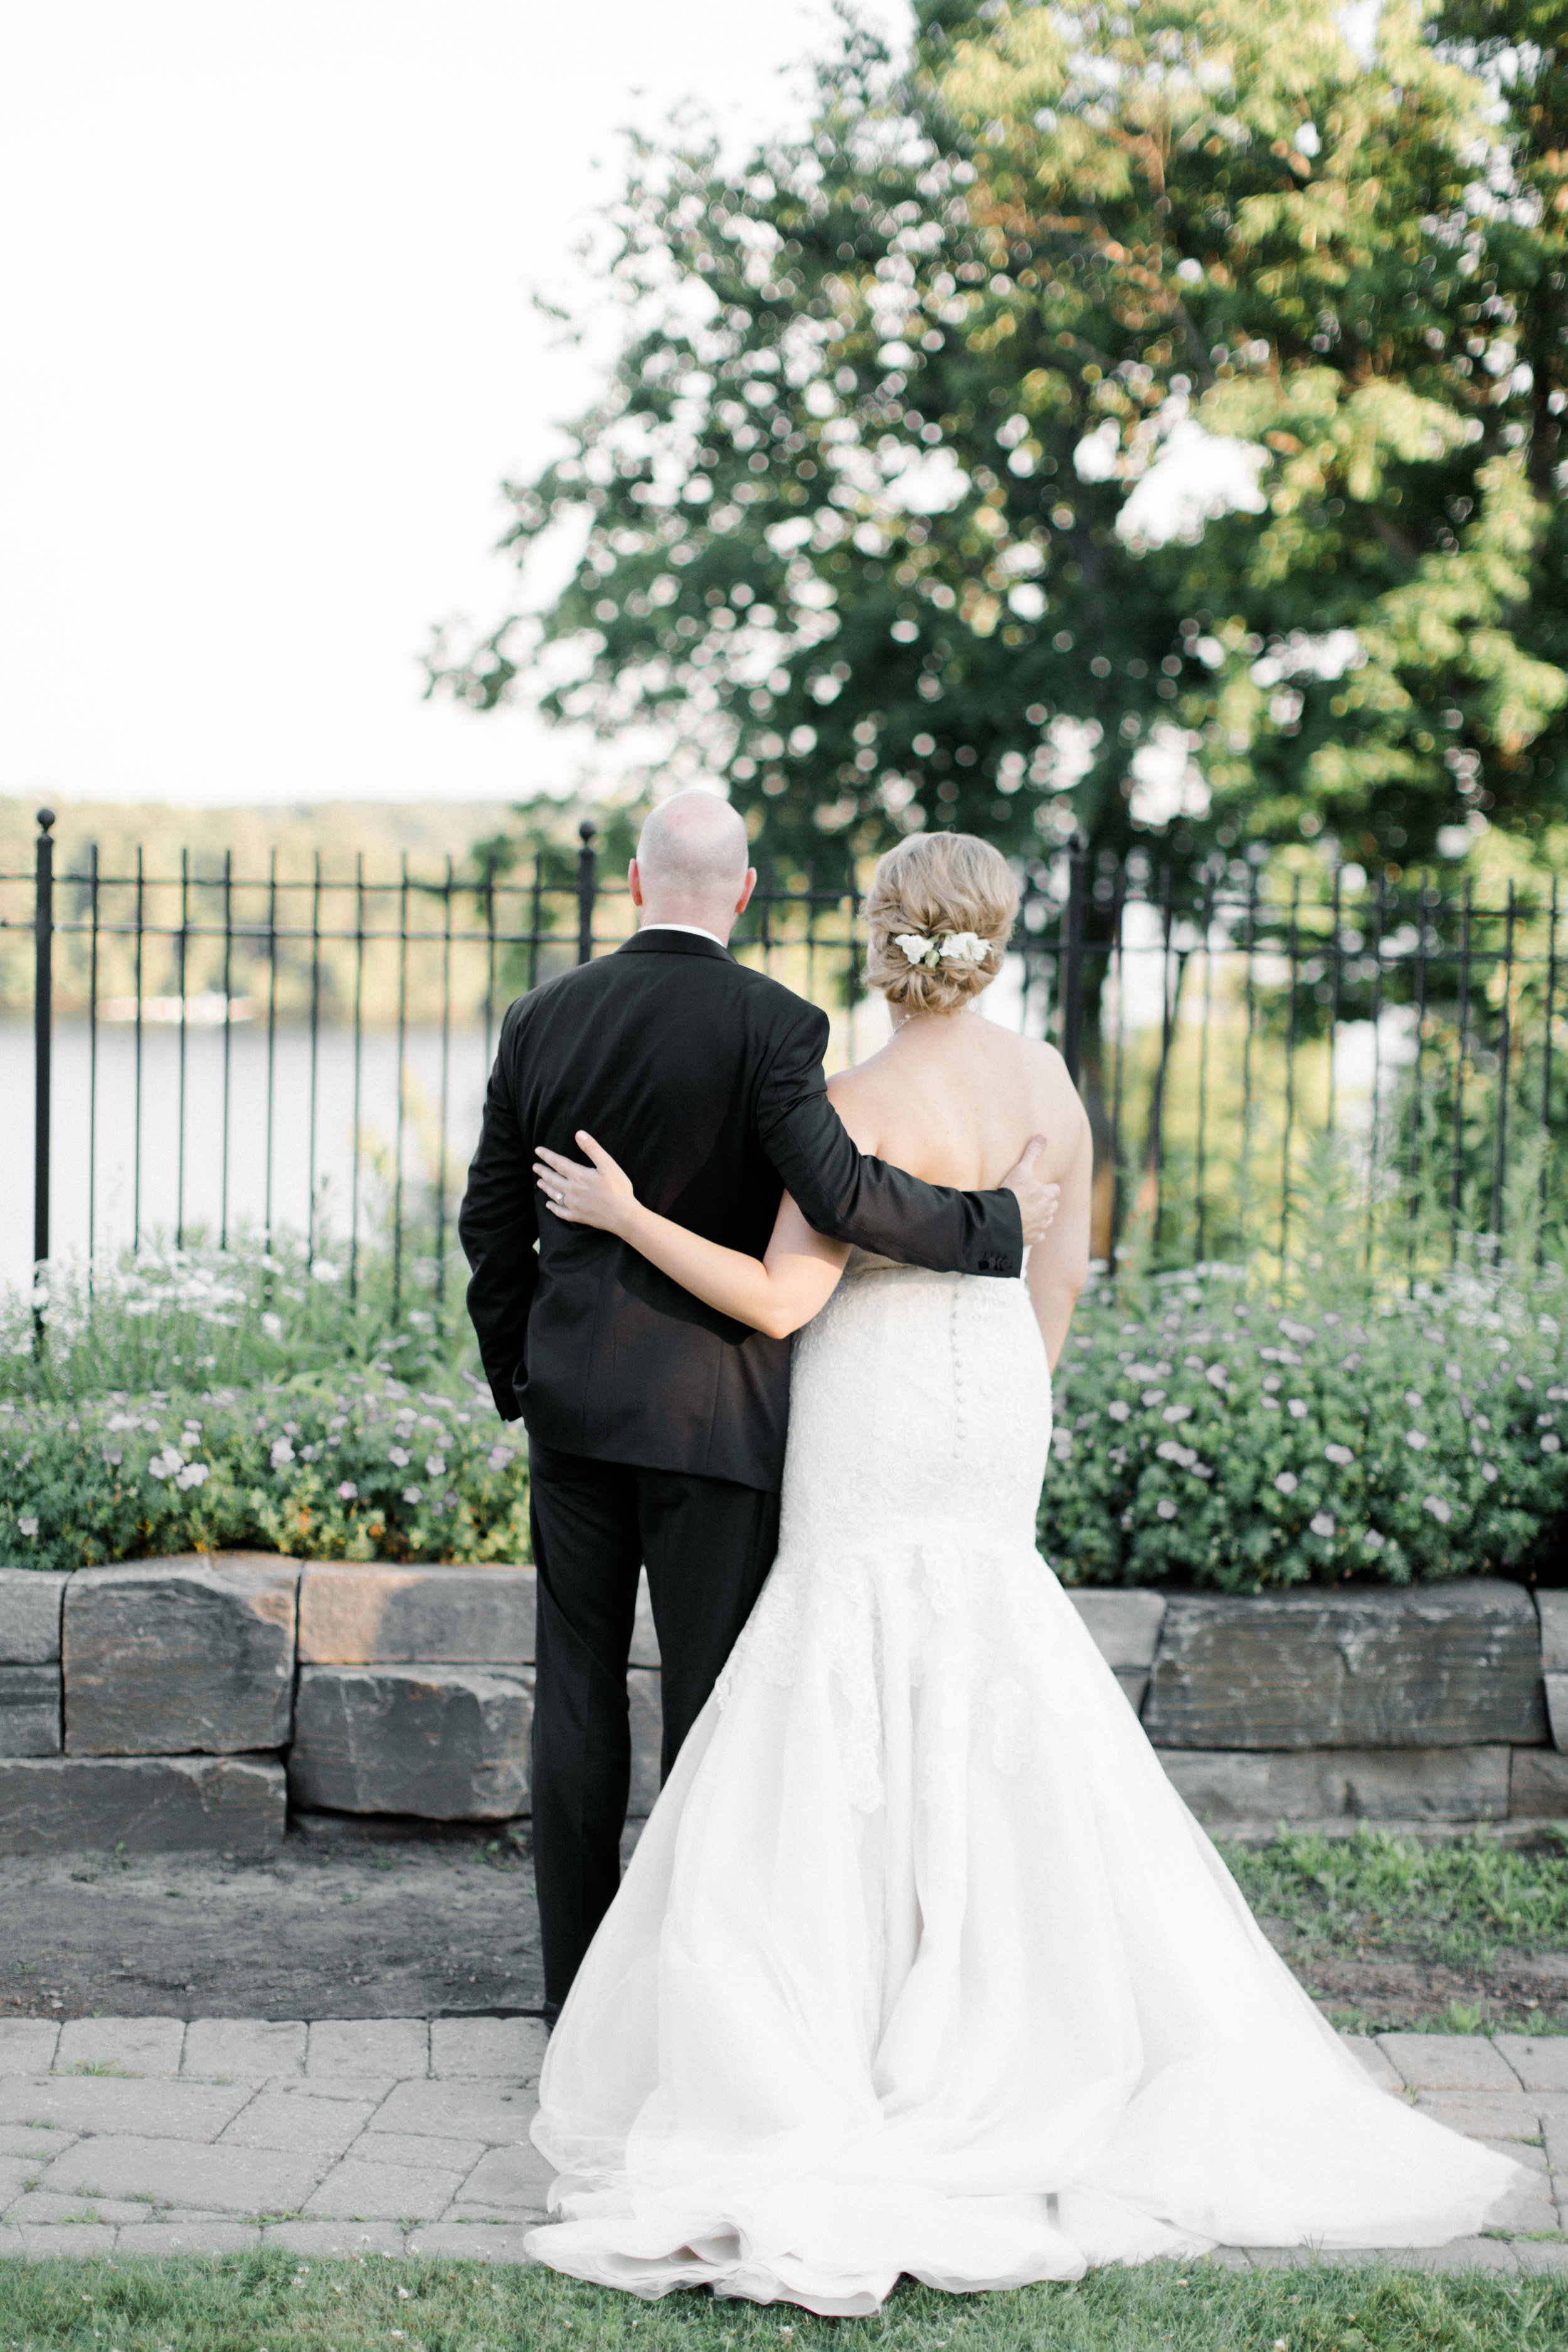 toronto-ontario-muskoka-rosseau-marriott-high-end-wedding-photographer-richelle-hunter-tori-doug-697.jpg